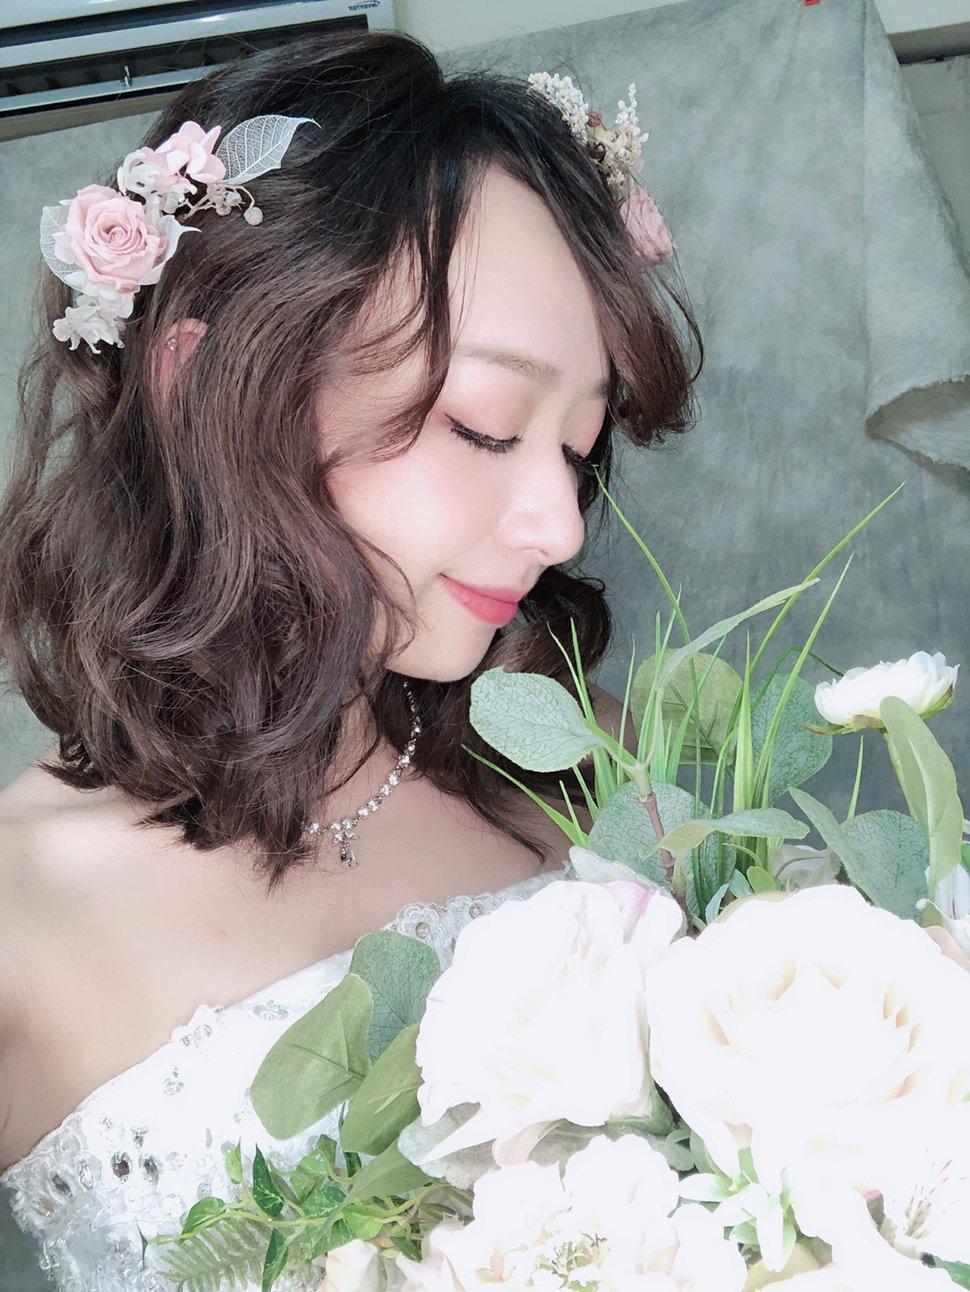 1556378190890 - Minami  彩妝造型 噴槍底妝 - 結婚吧